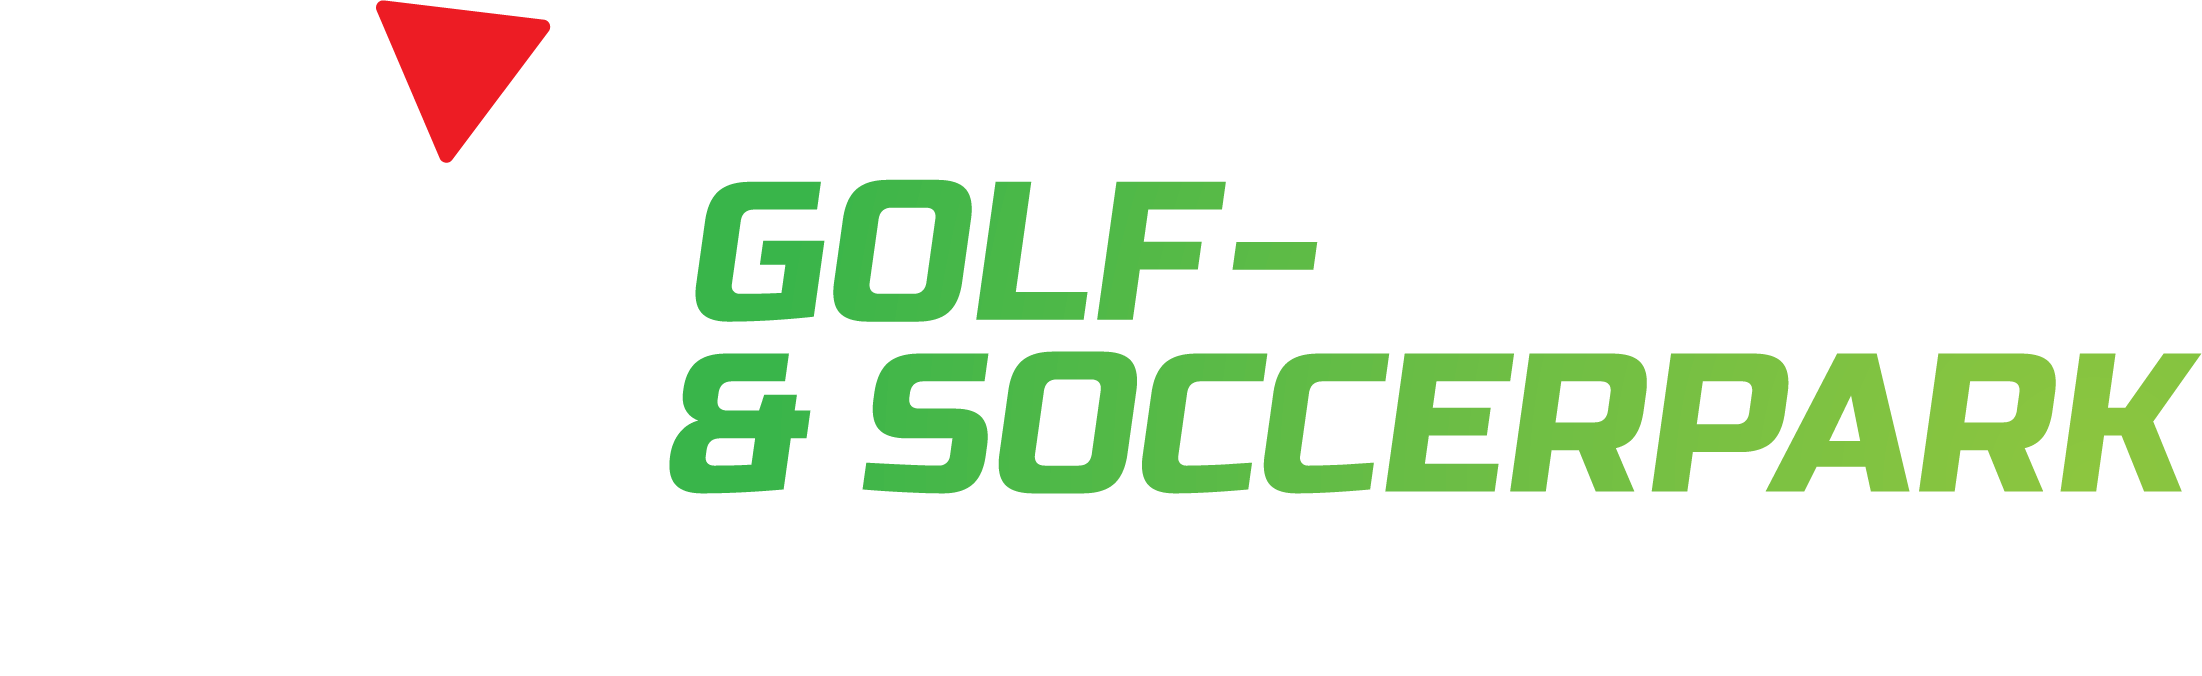 Golf- & Soccerpark Bad Harzburg